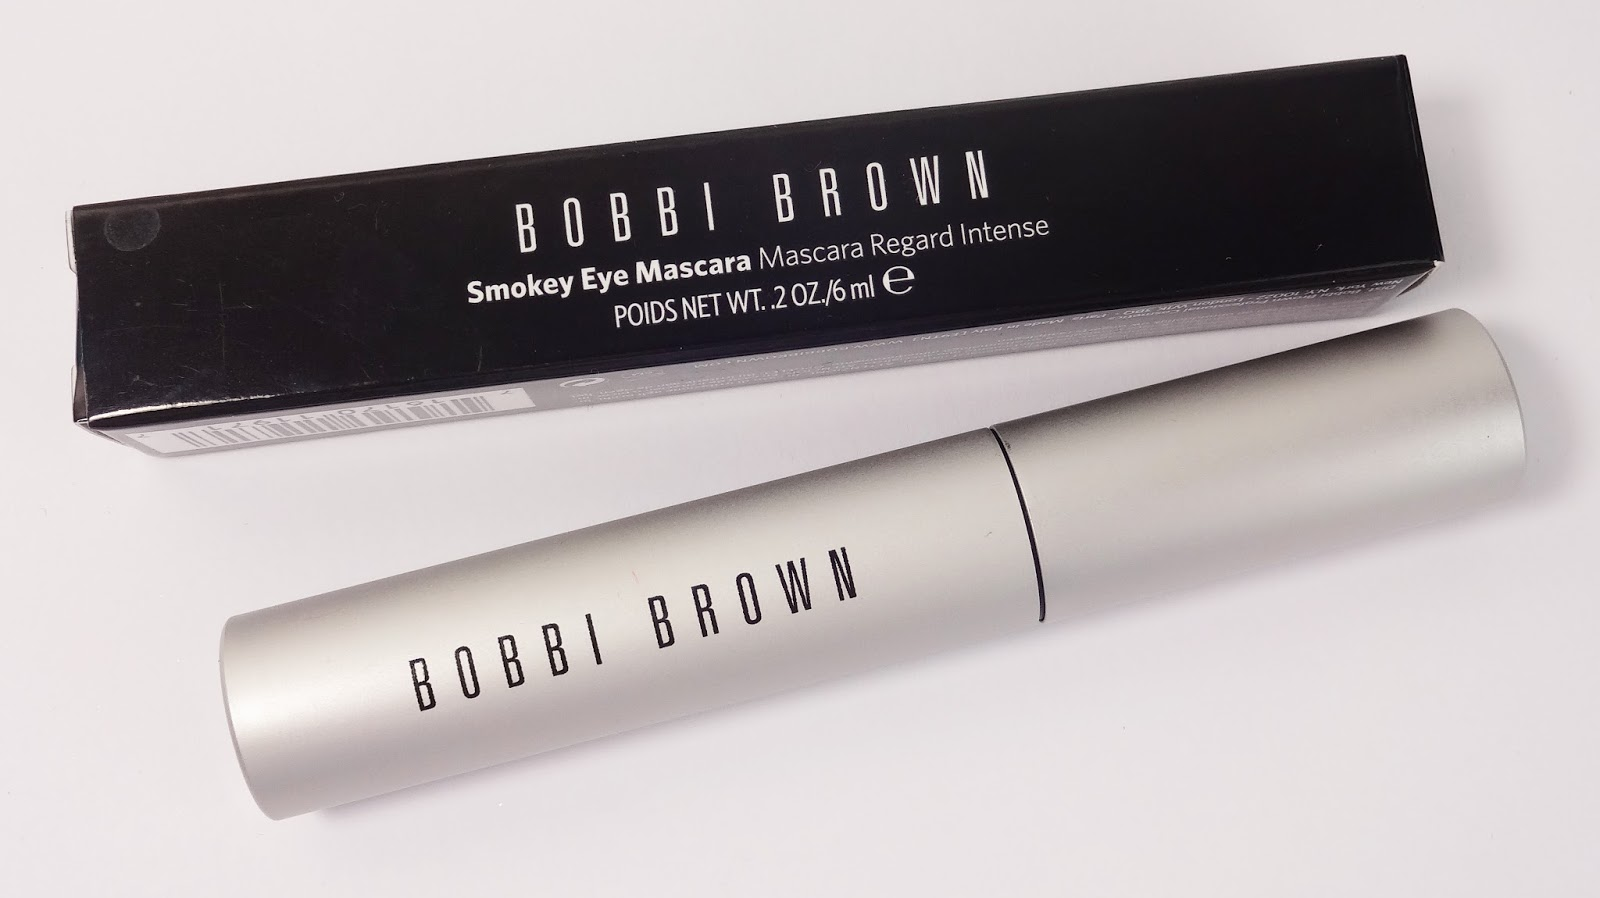 Bobbi Brown - Smokey Eye Mascara Pretty Clover Beautyblog